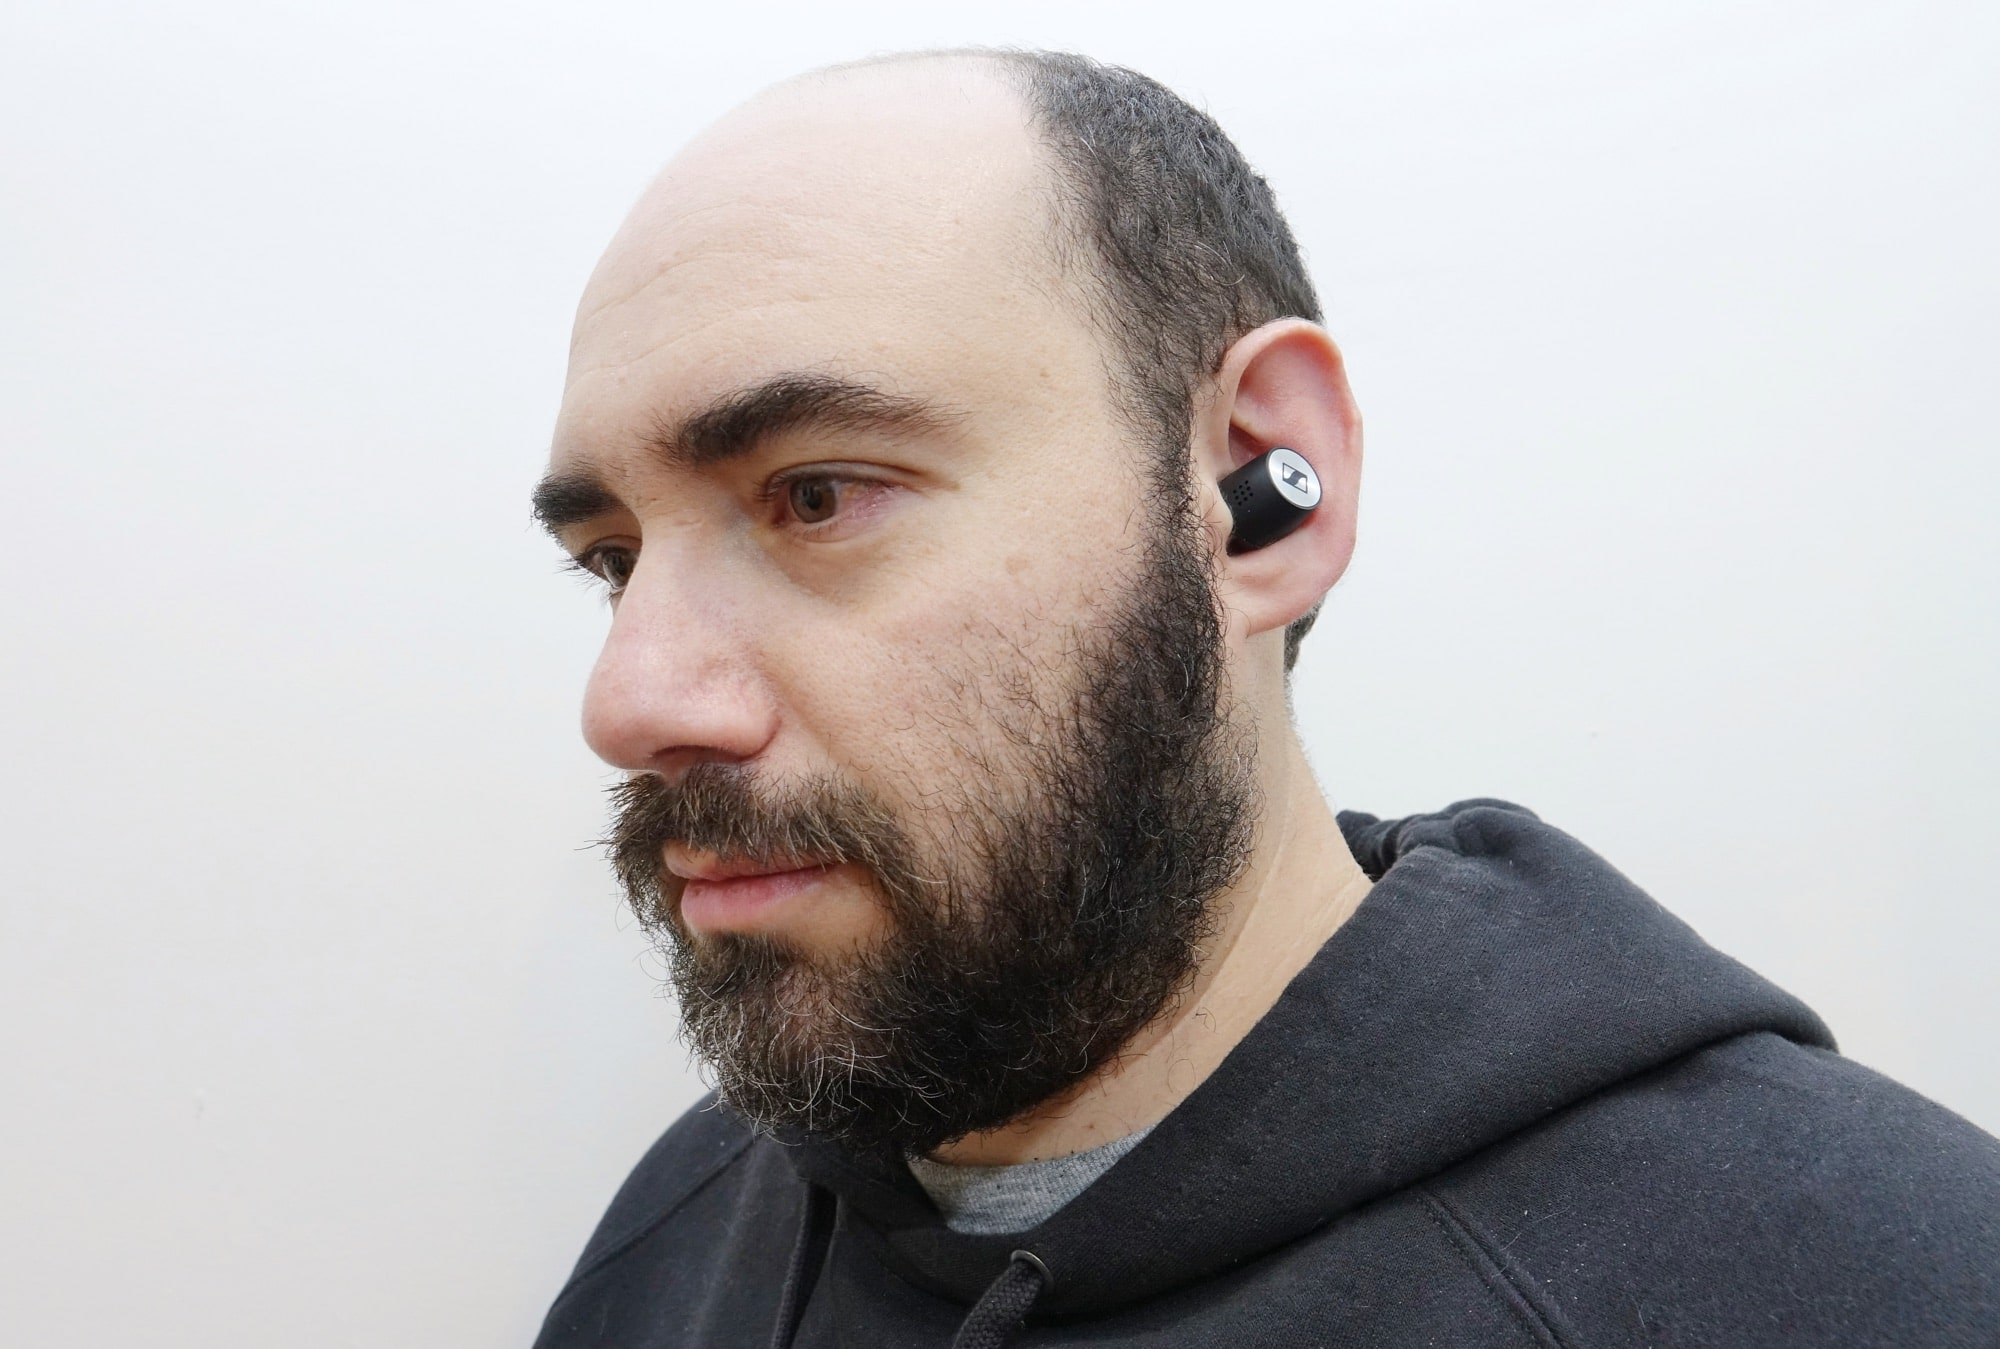 Wearing the Sennheiser Momentum True Wireless 2